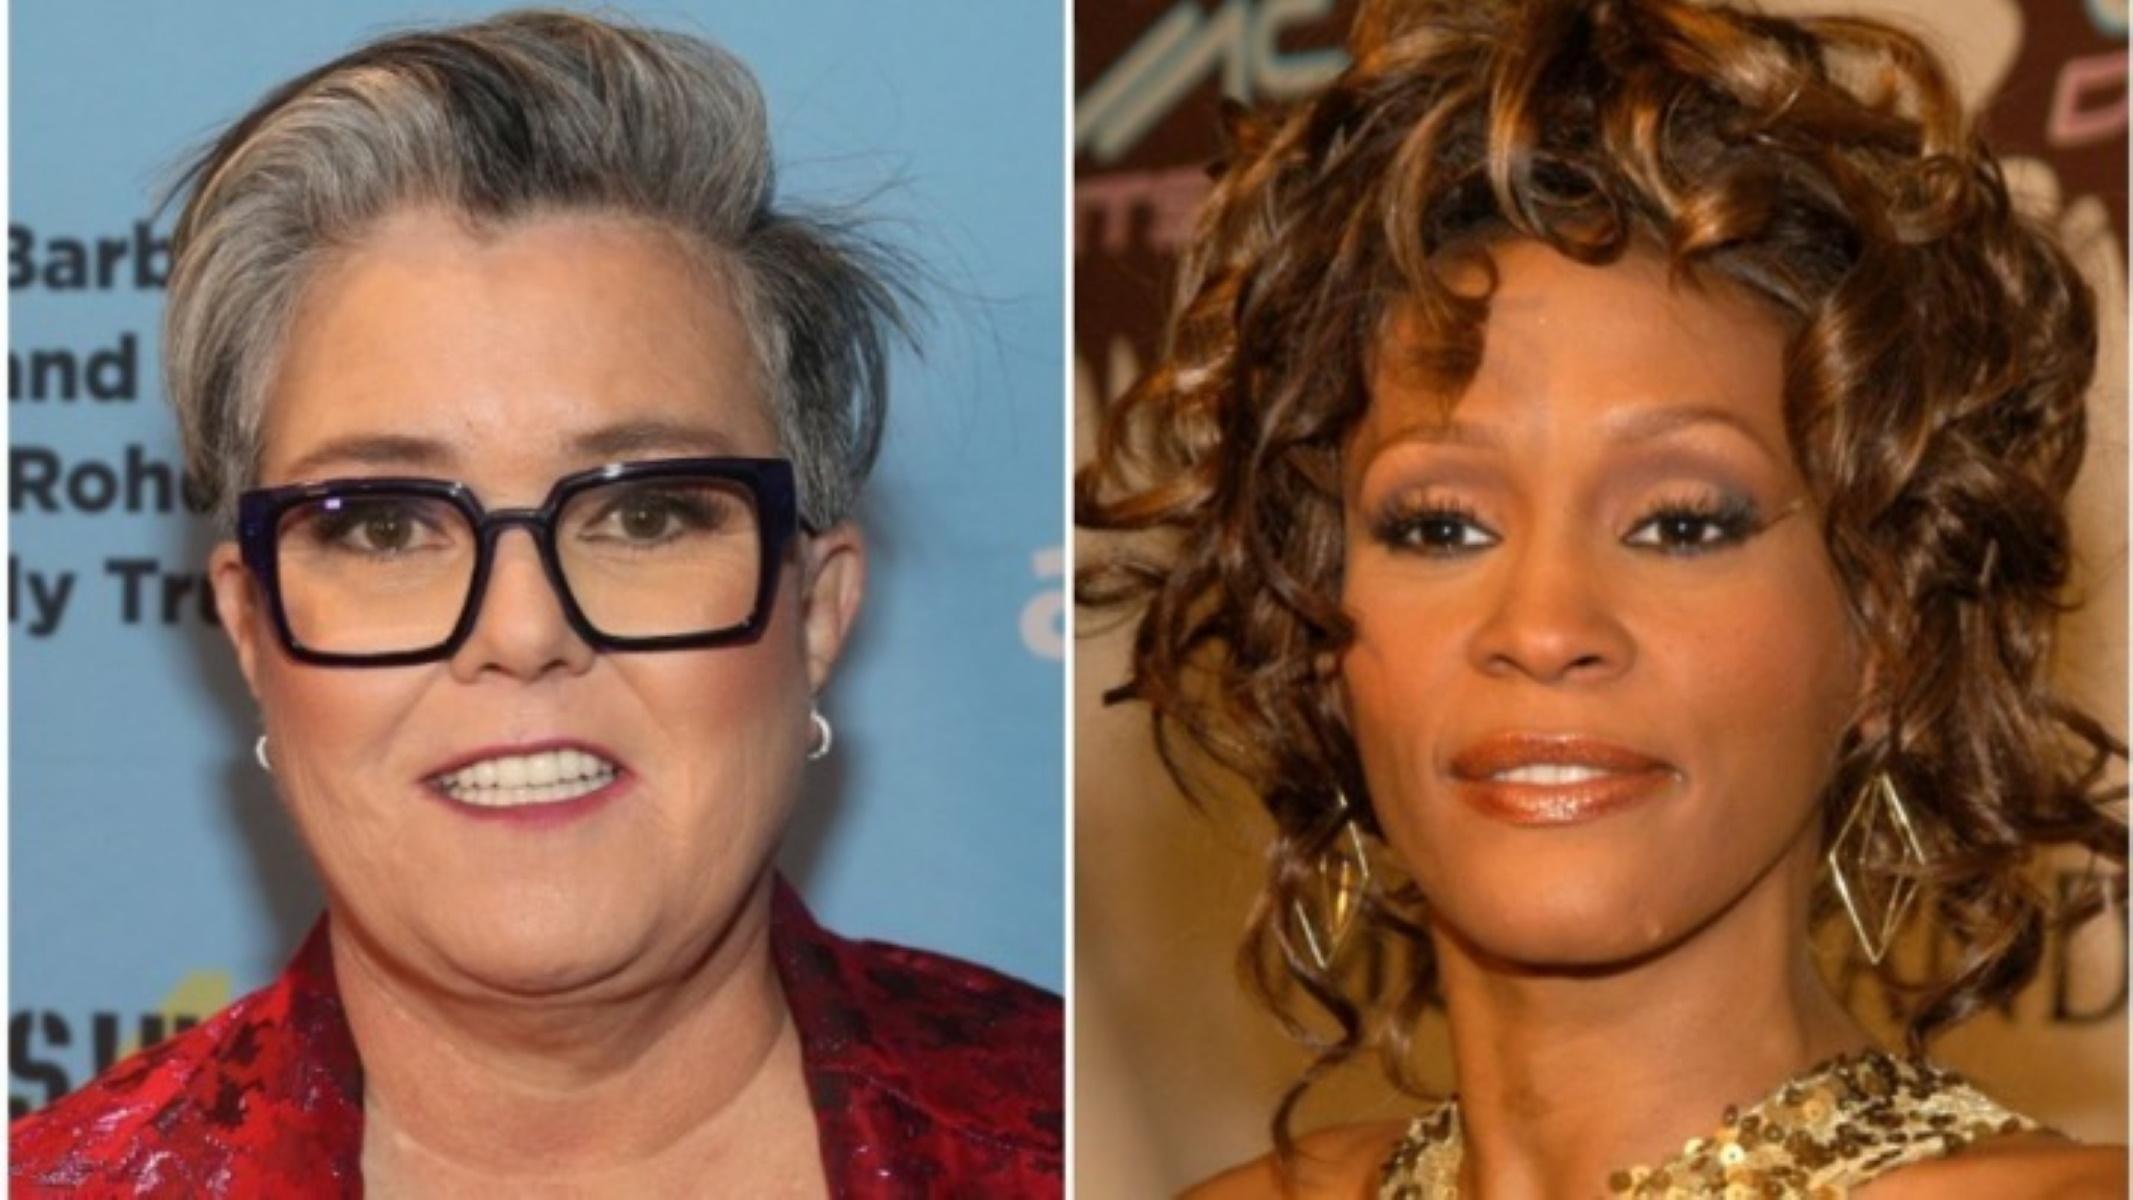 H Ρόζι Ο' Ντόνελ μιλά για την bisexual Whitney Houston